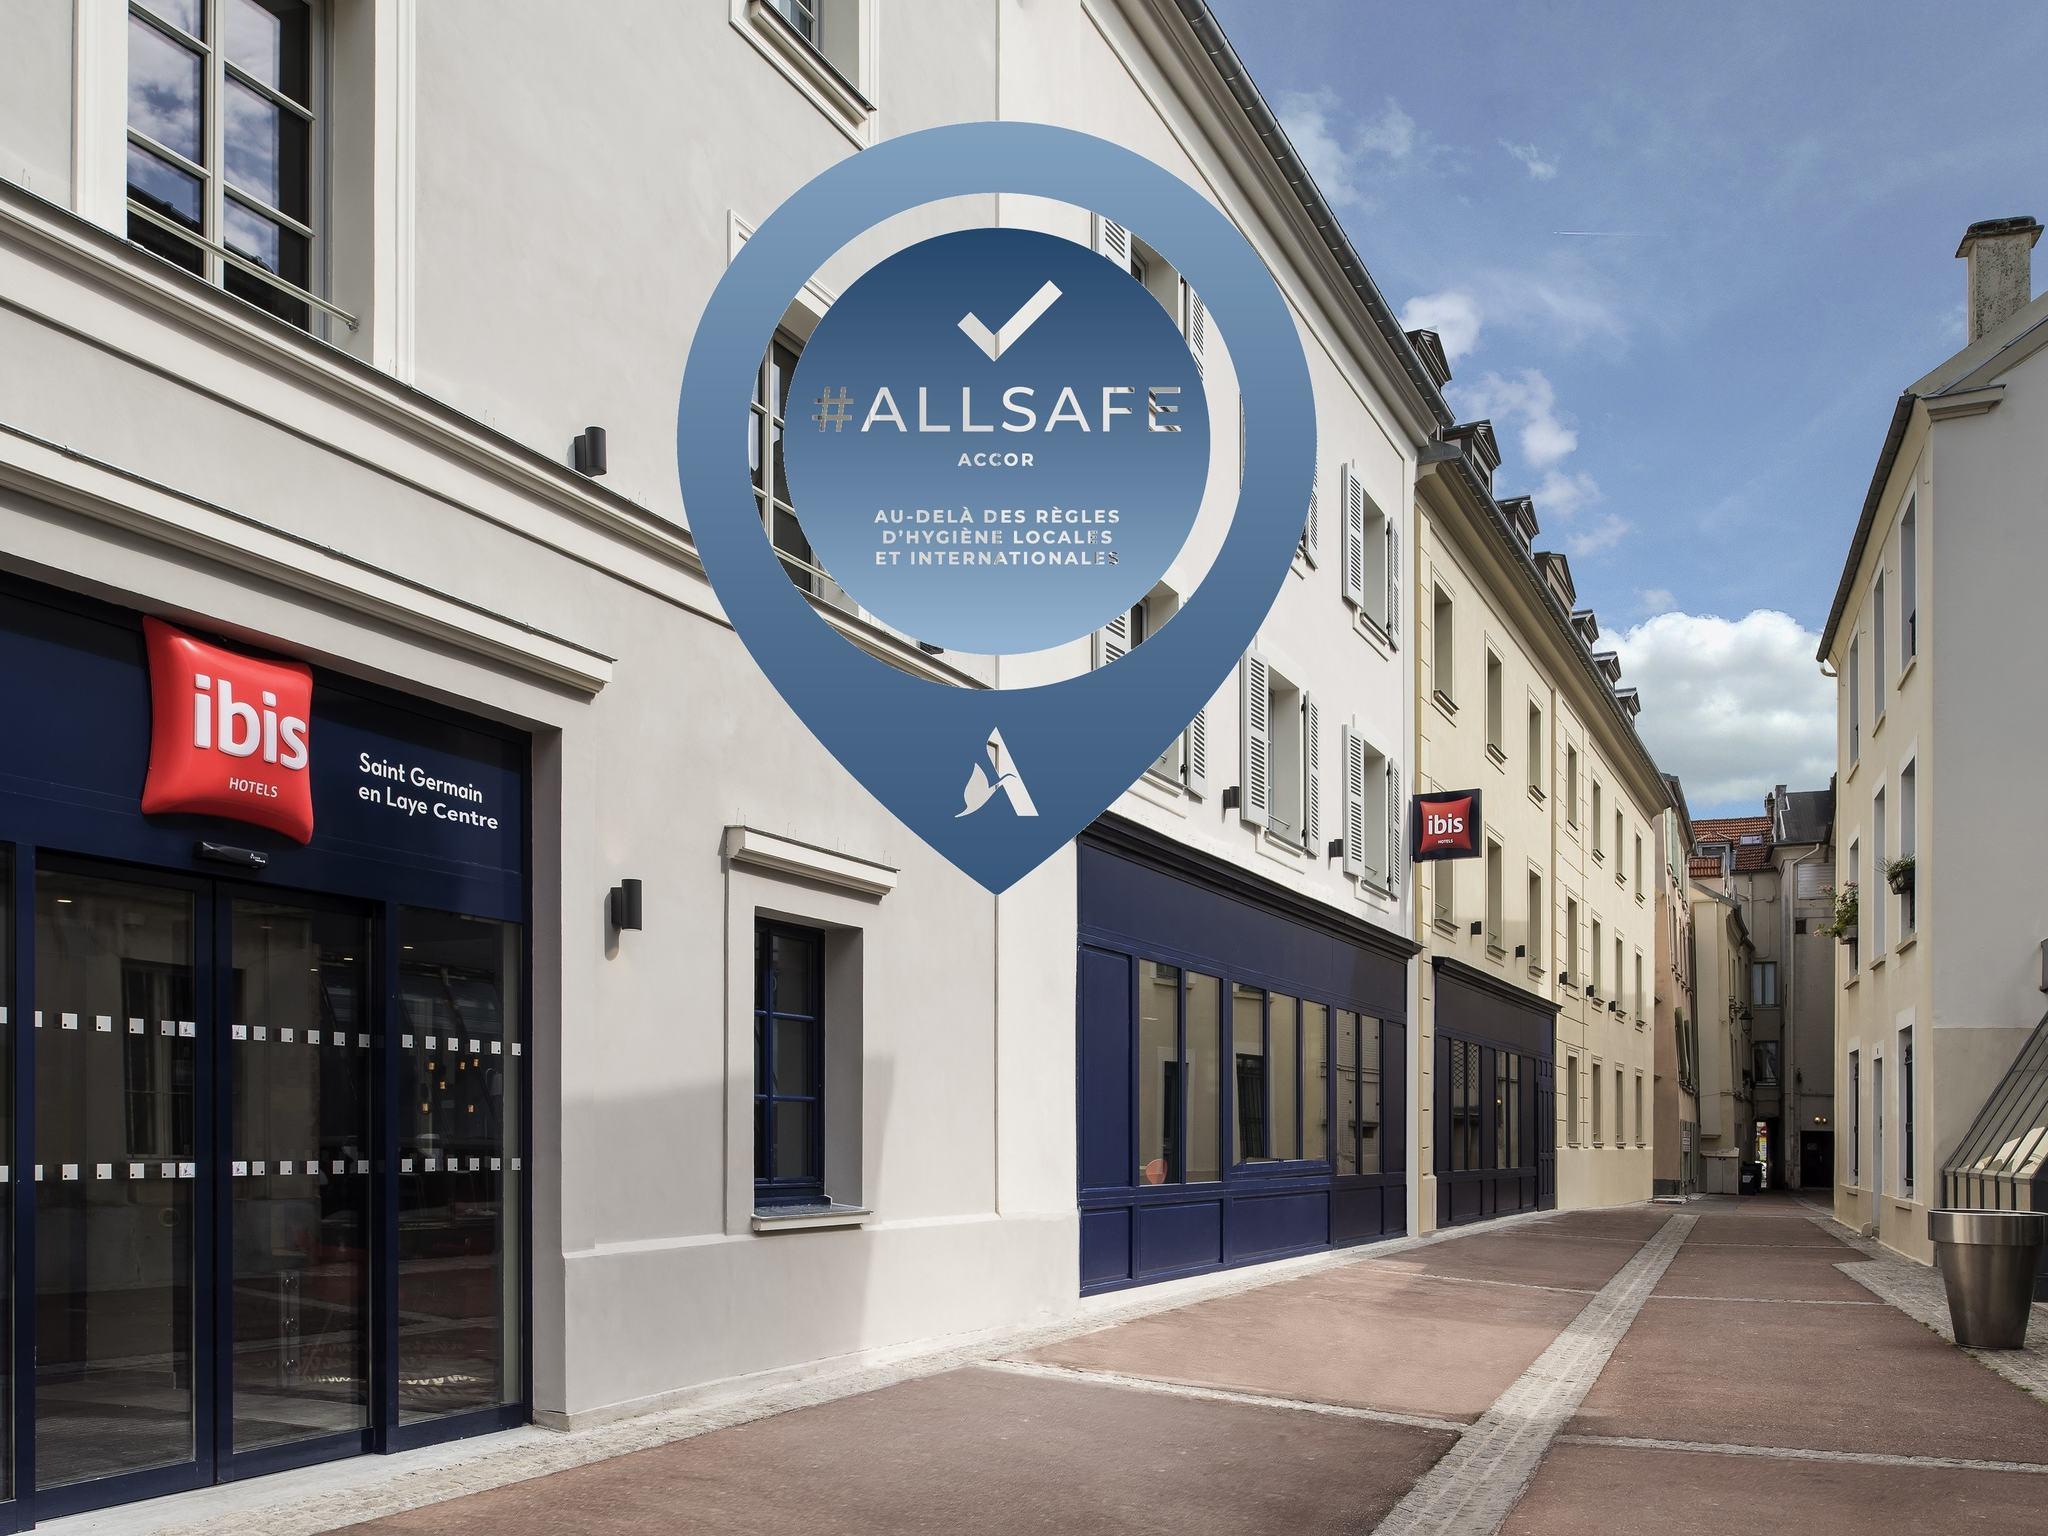 Hotel – ibis Saint Germain en Laye Centre